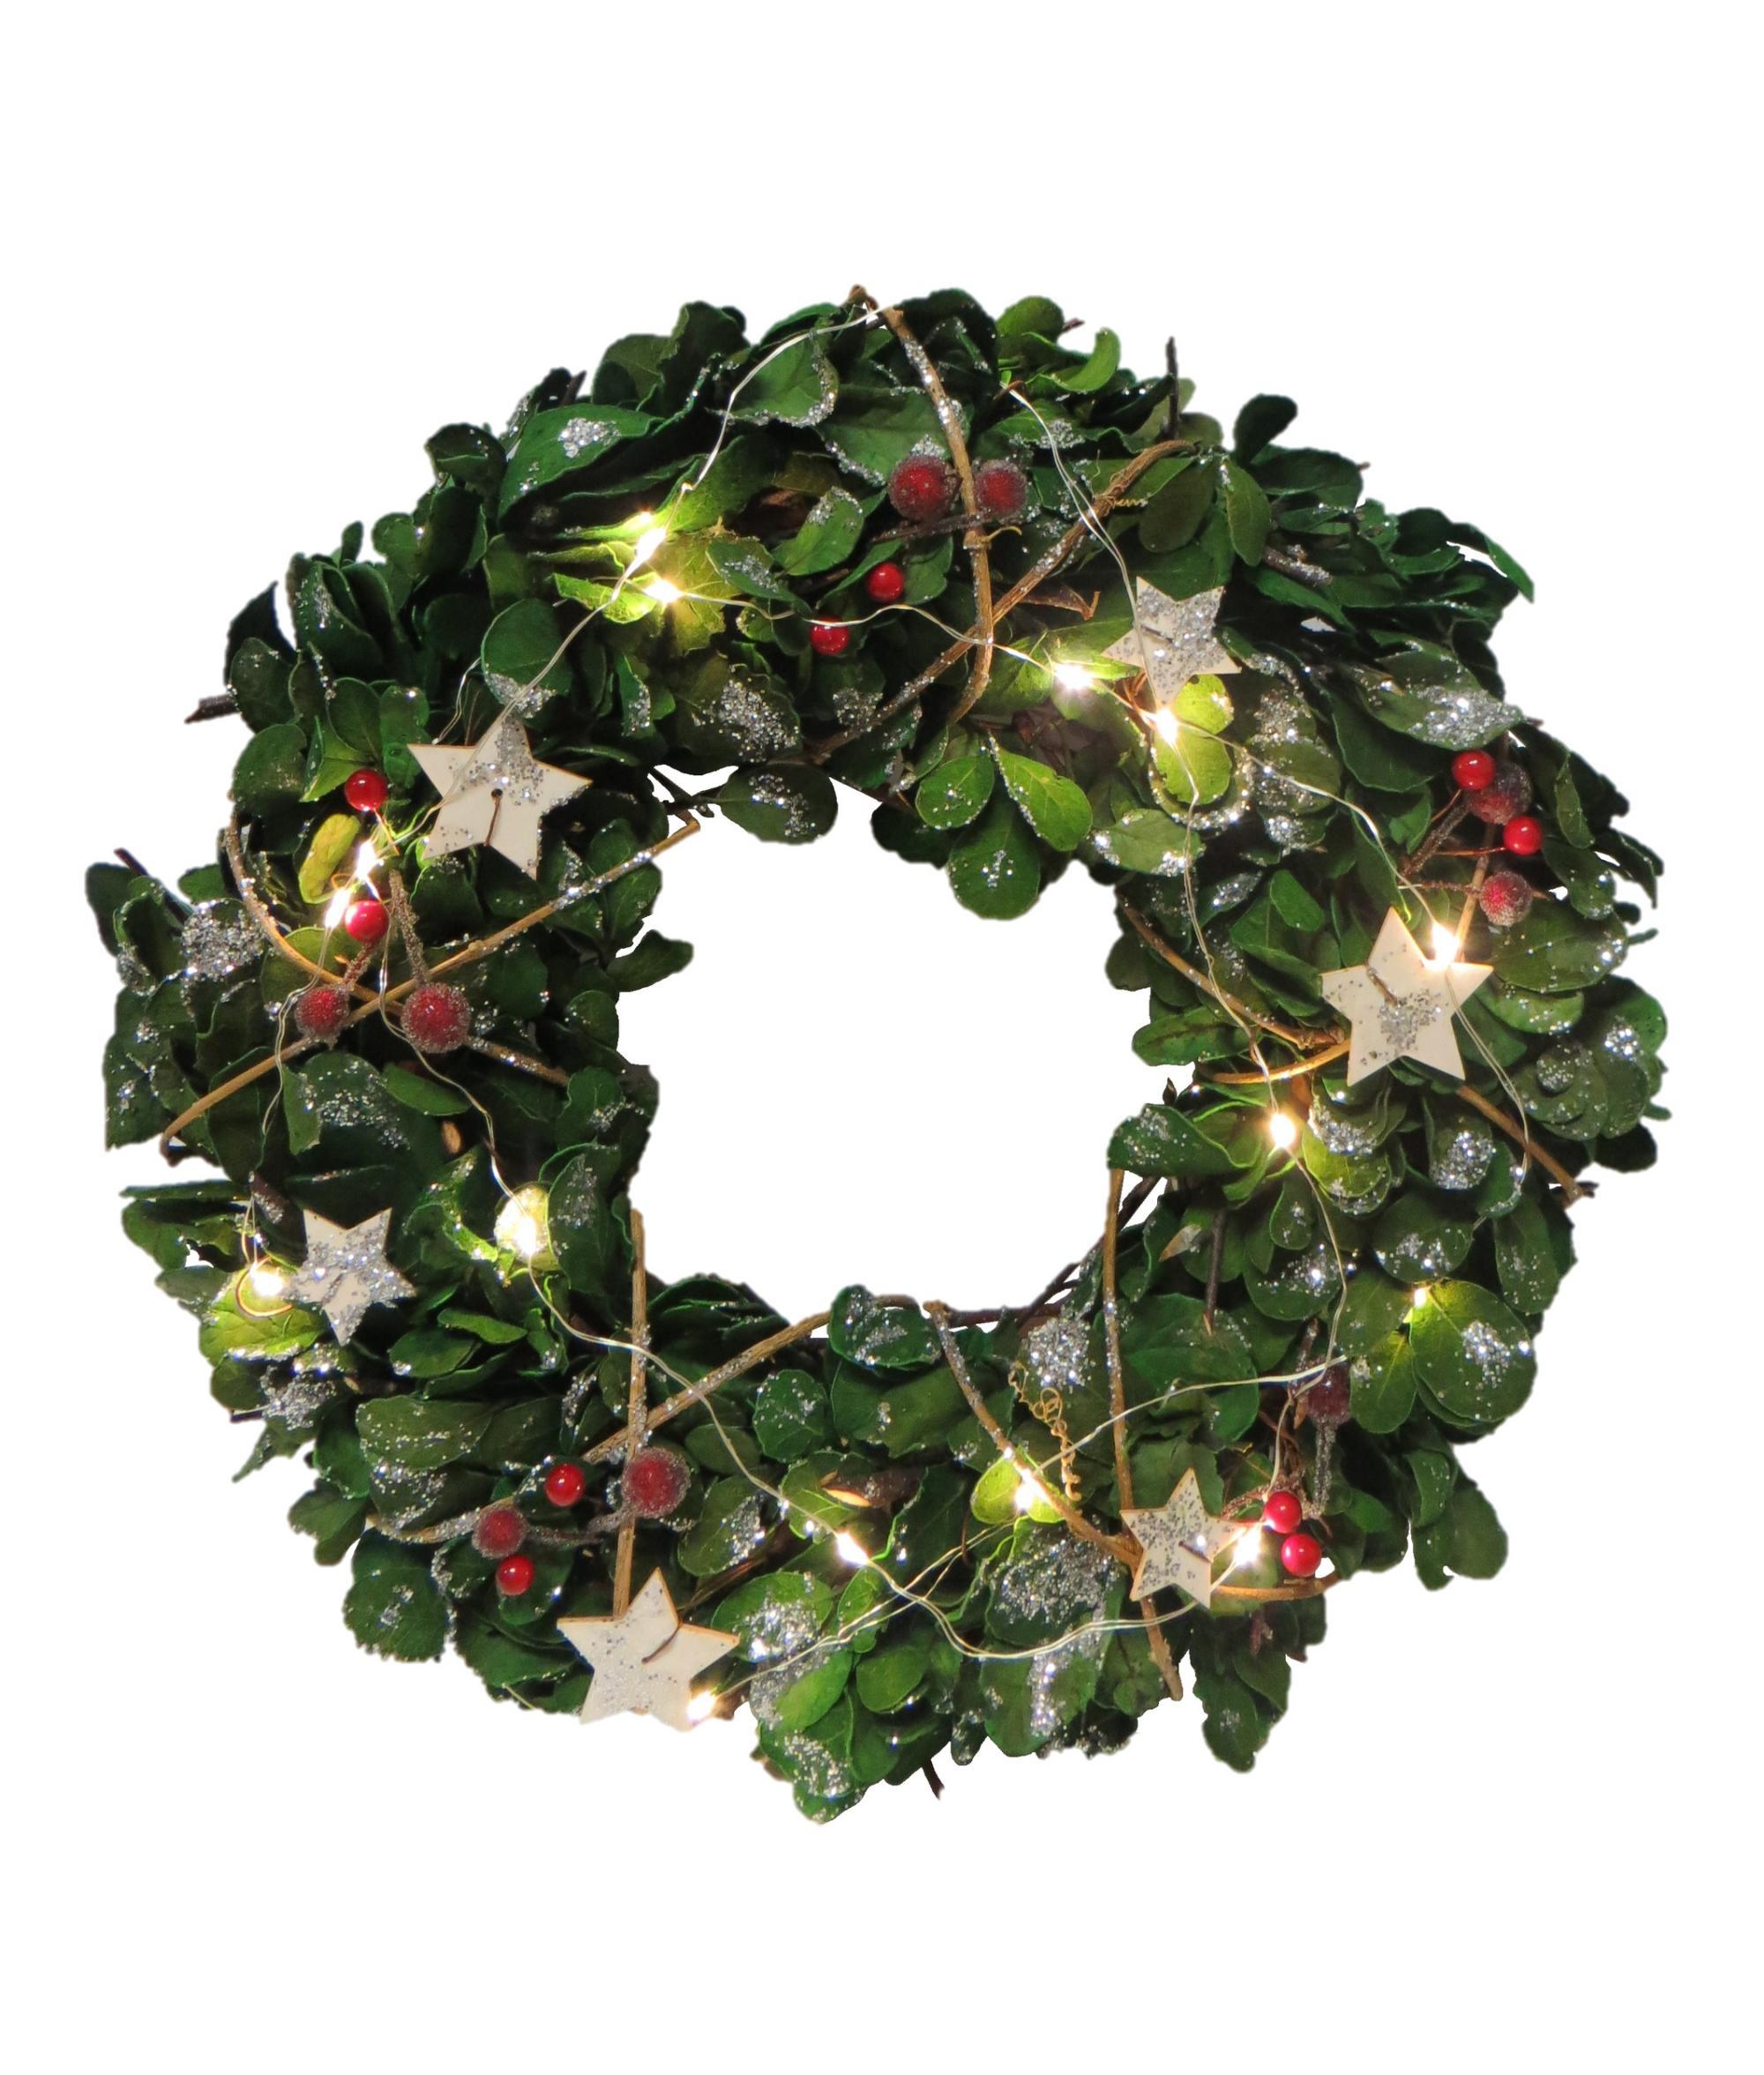 Led Lit Eucalyptus Christmas Wreath Cancer Research Uk Online Shop